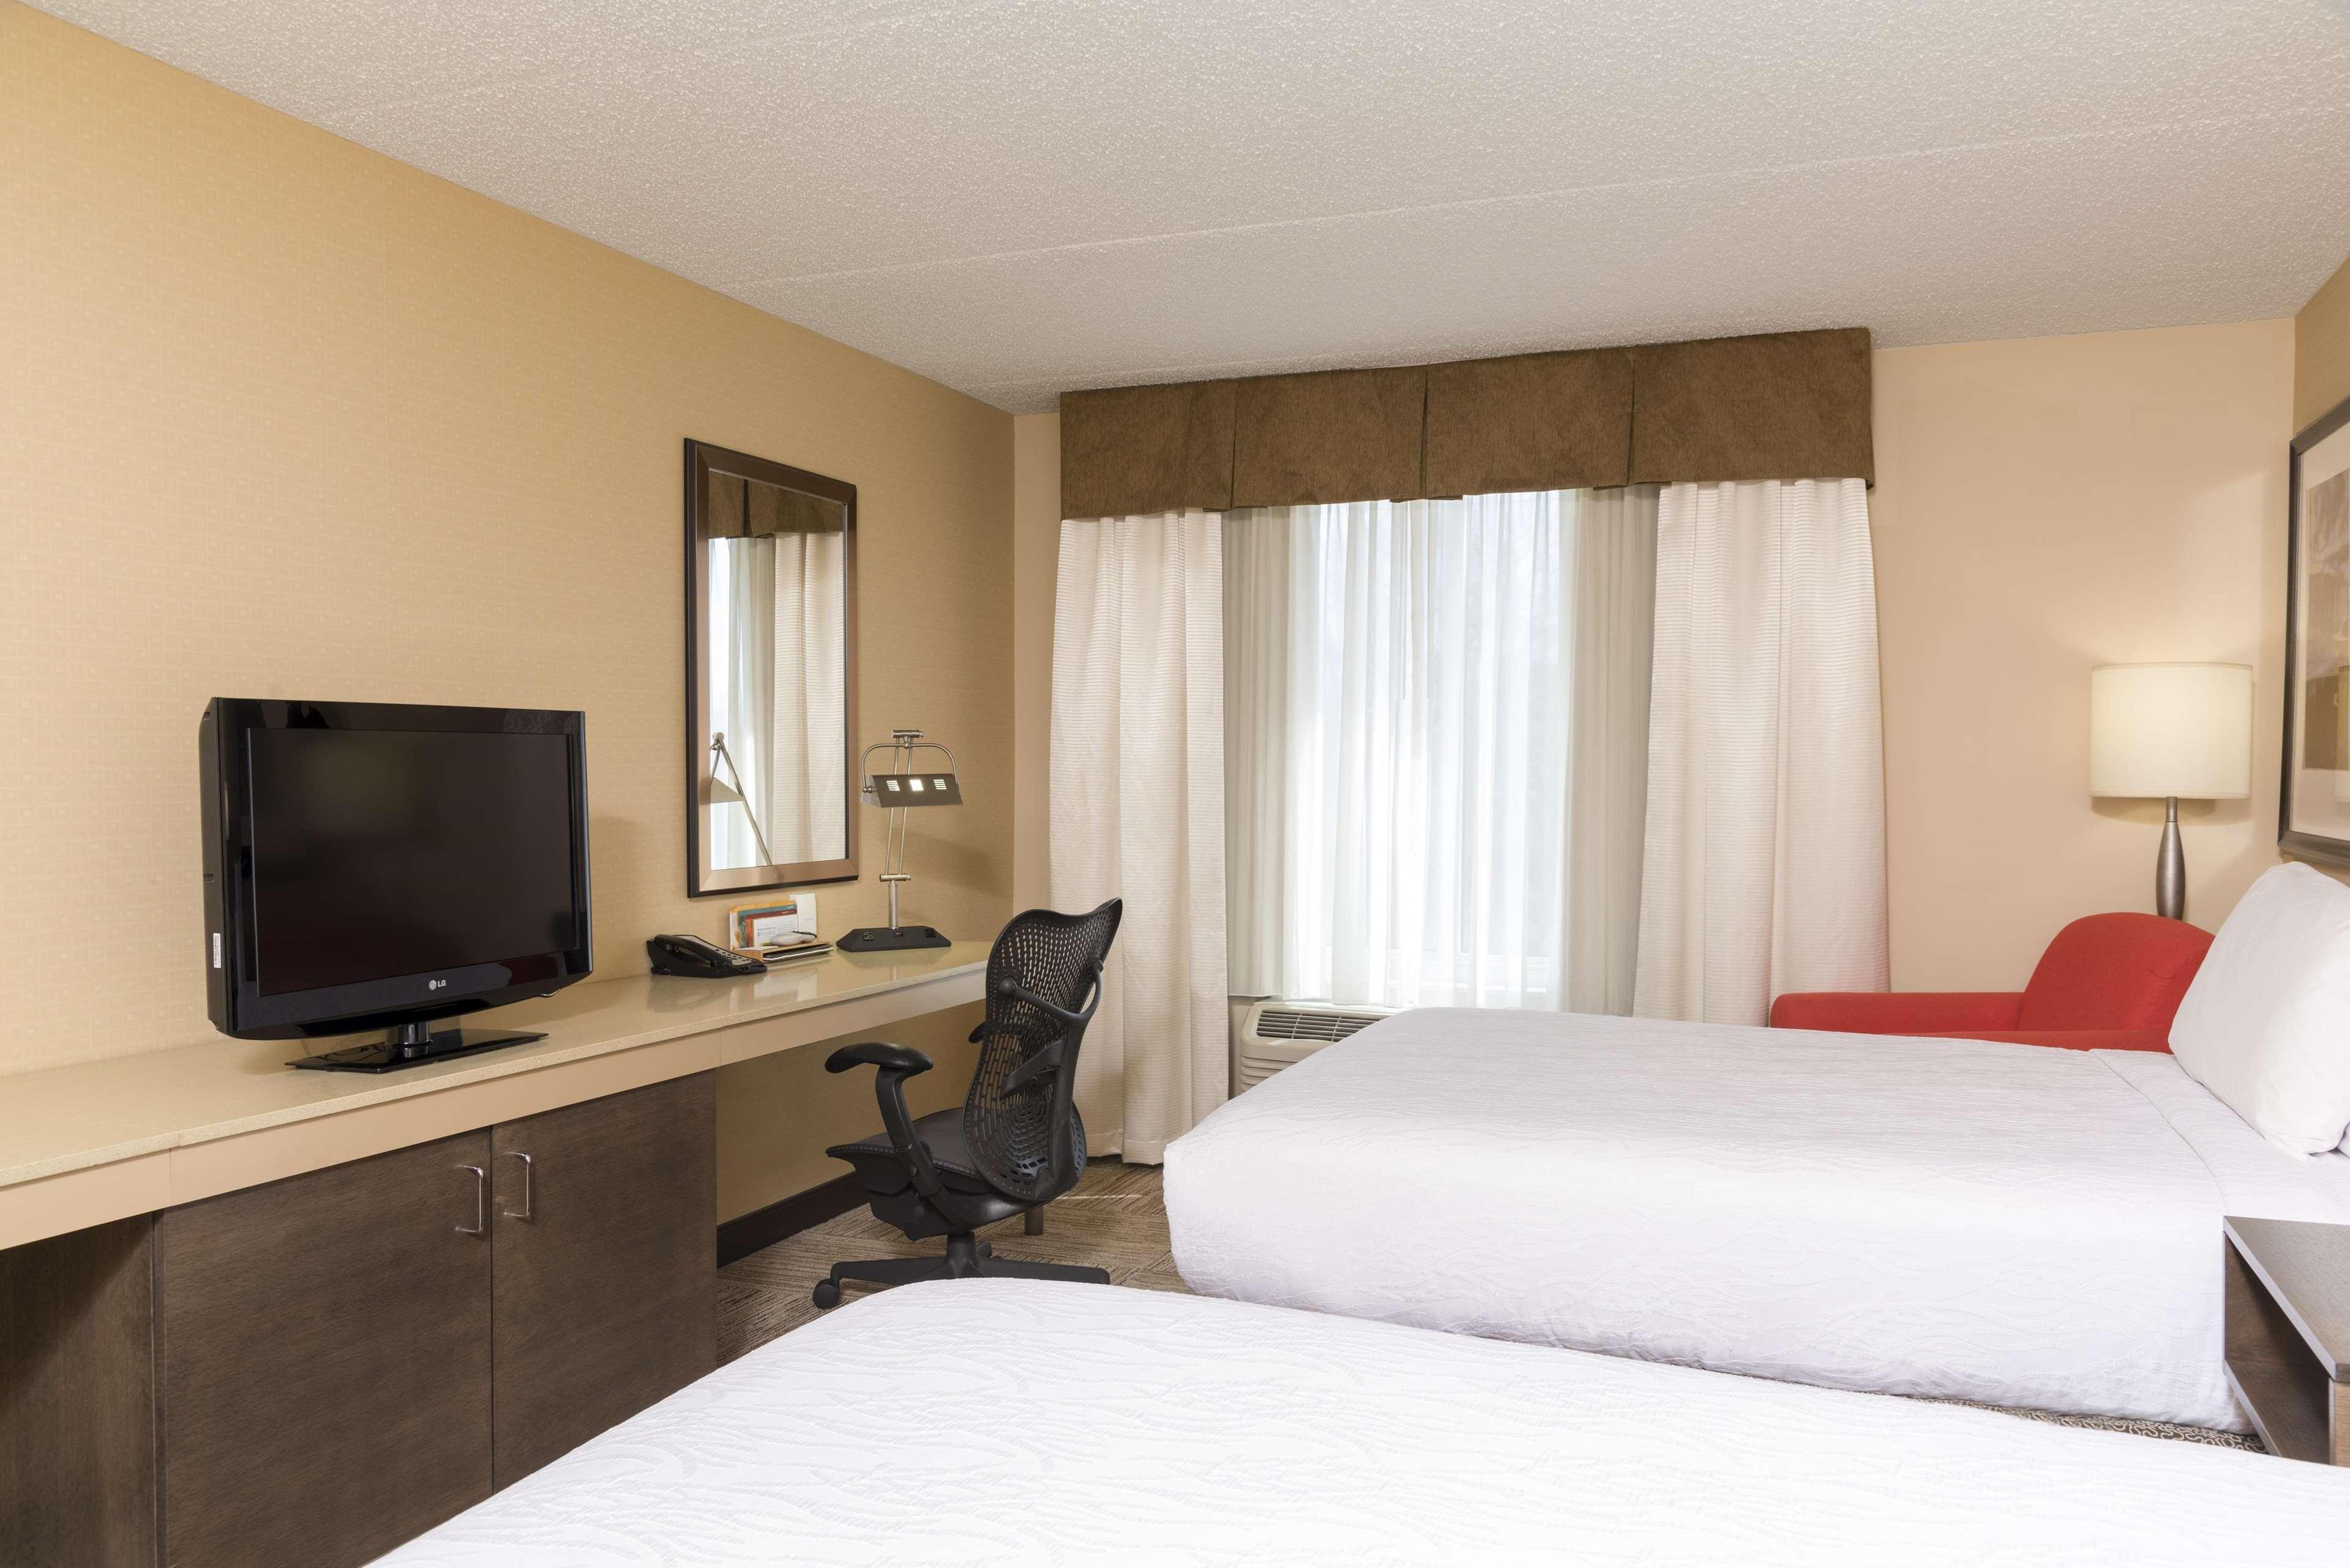 Hilton Garden Inn West Lafayette Wabash Landing image 19